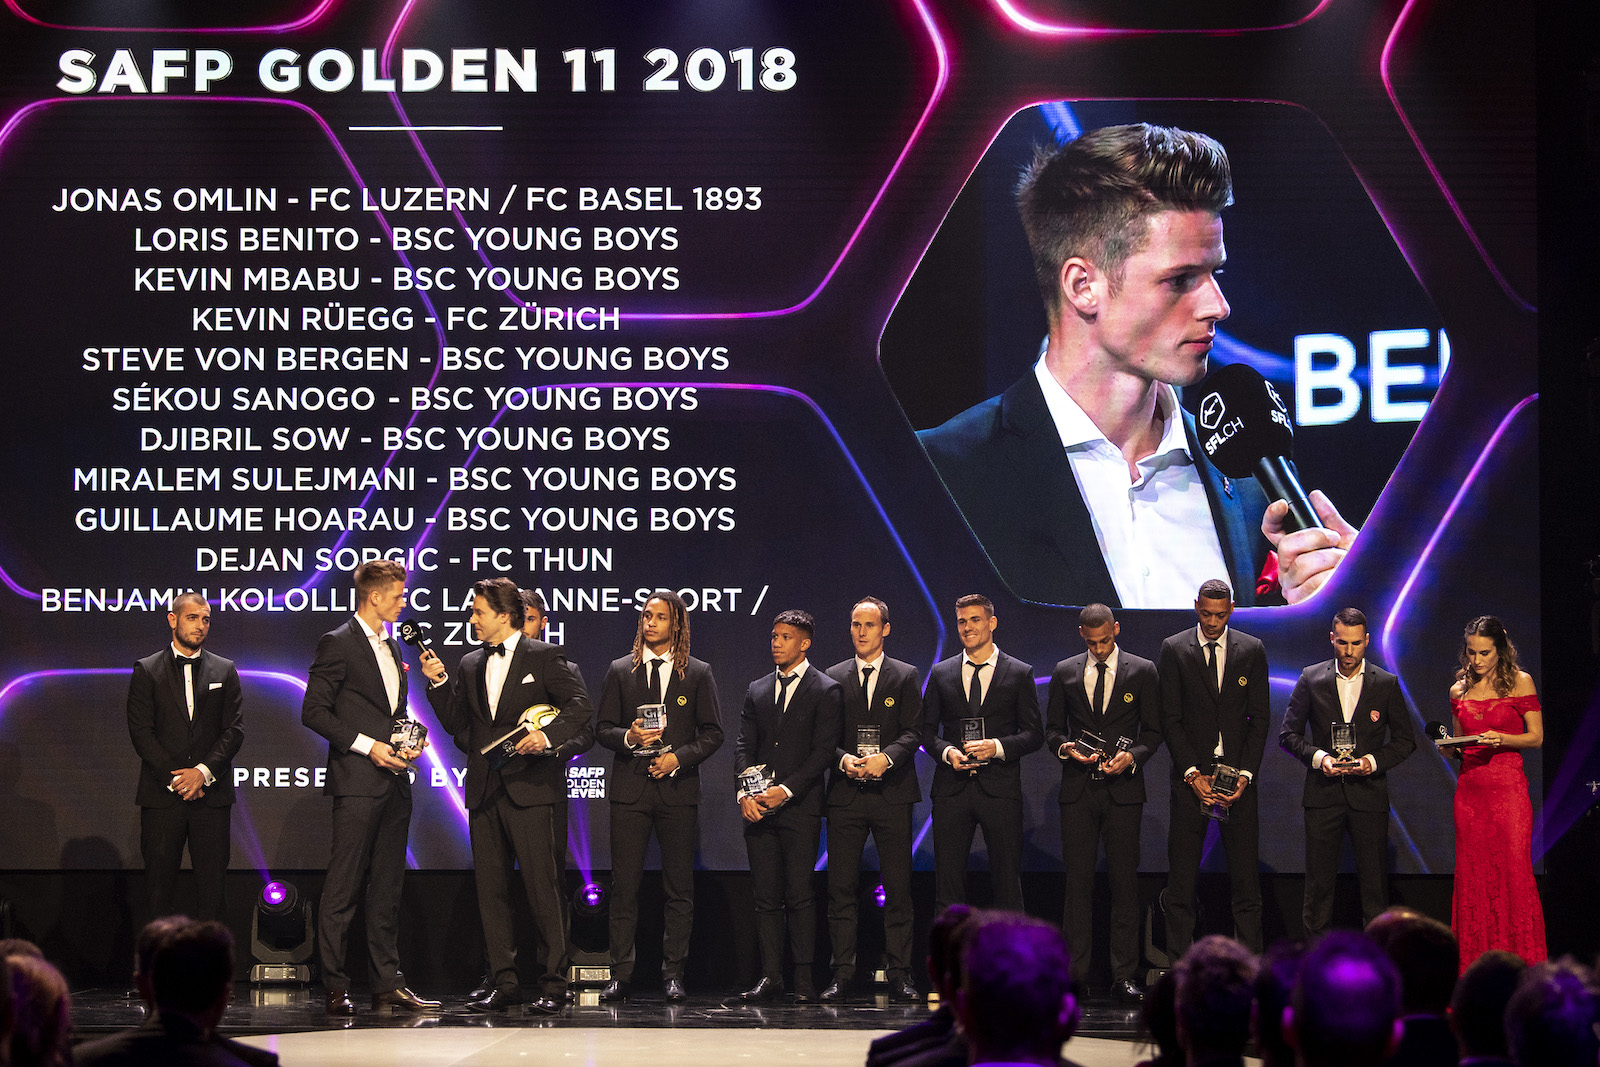 SAFP Golden11 2018 (COPYRIGHT Claudio de Capitani/freshfocus)